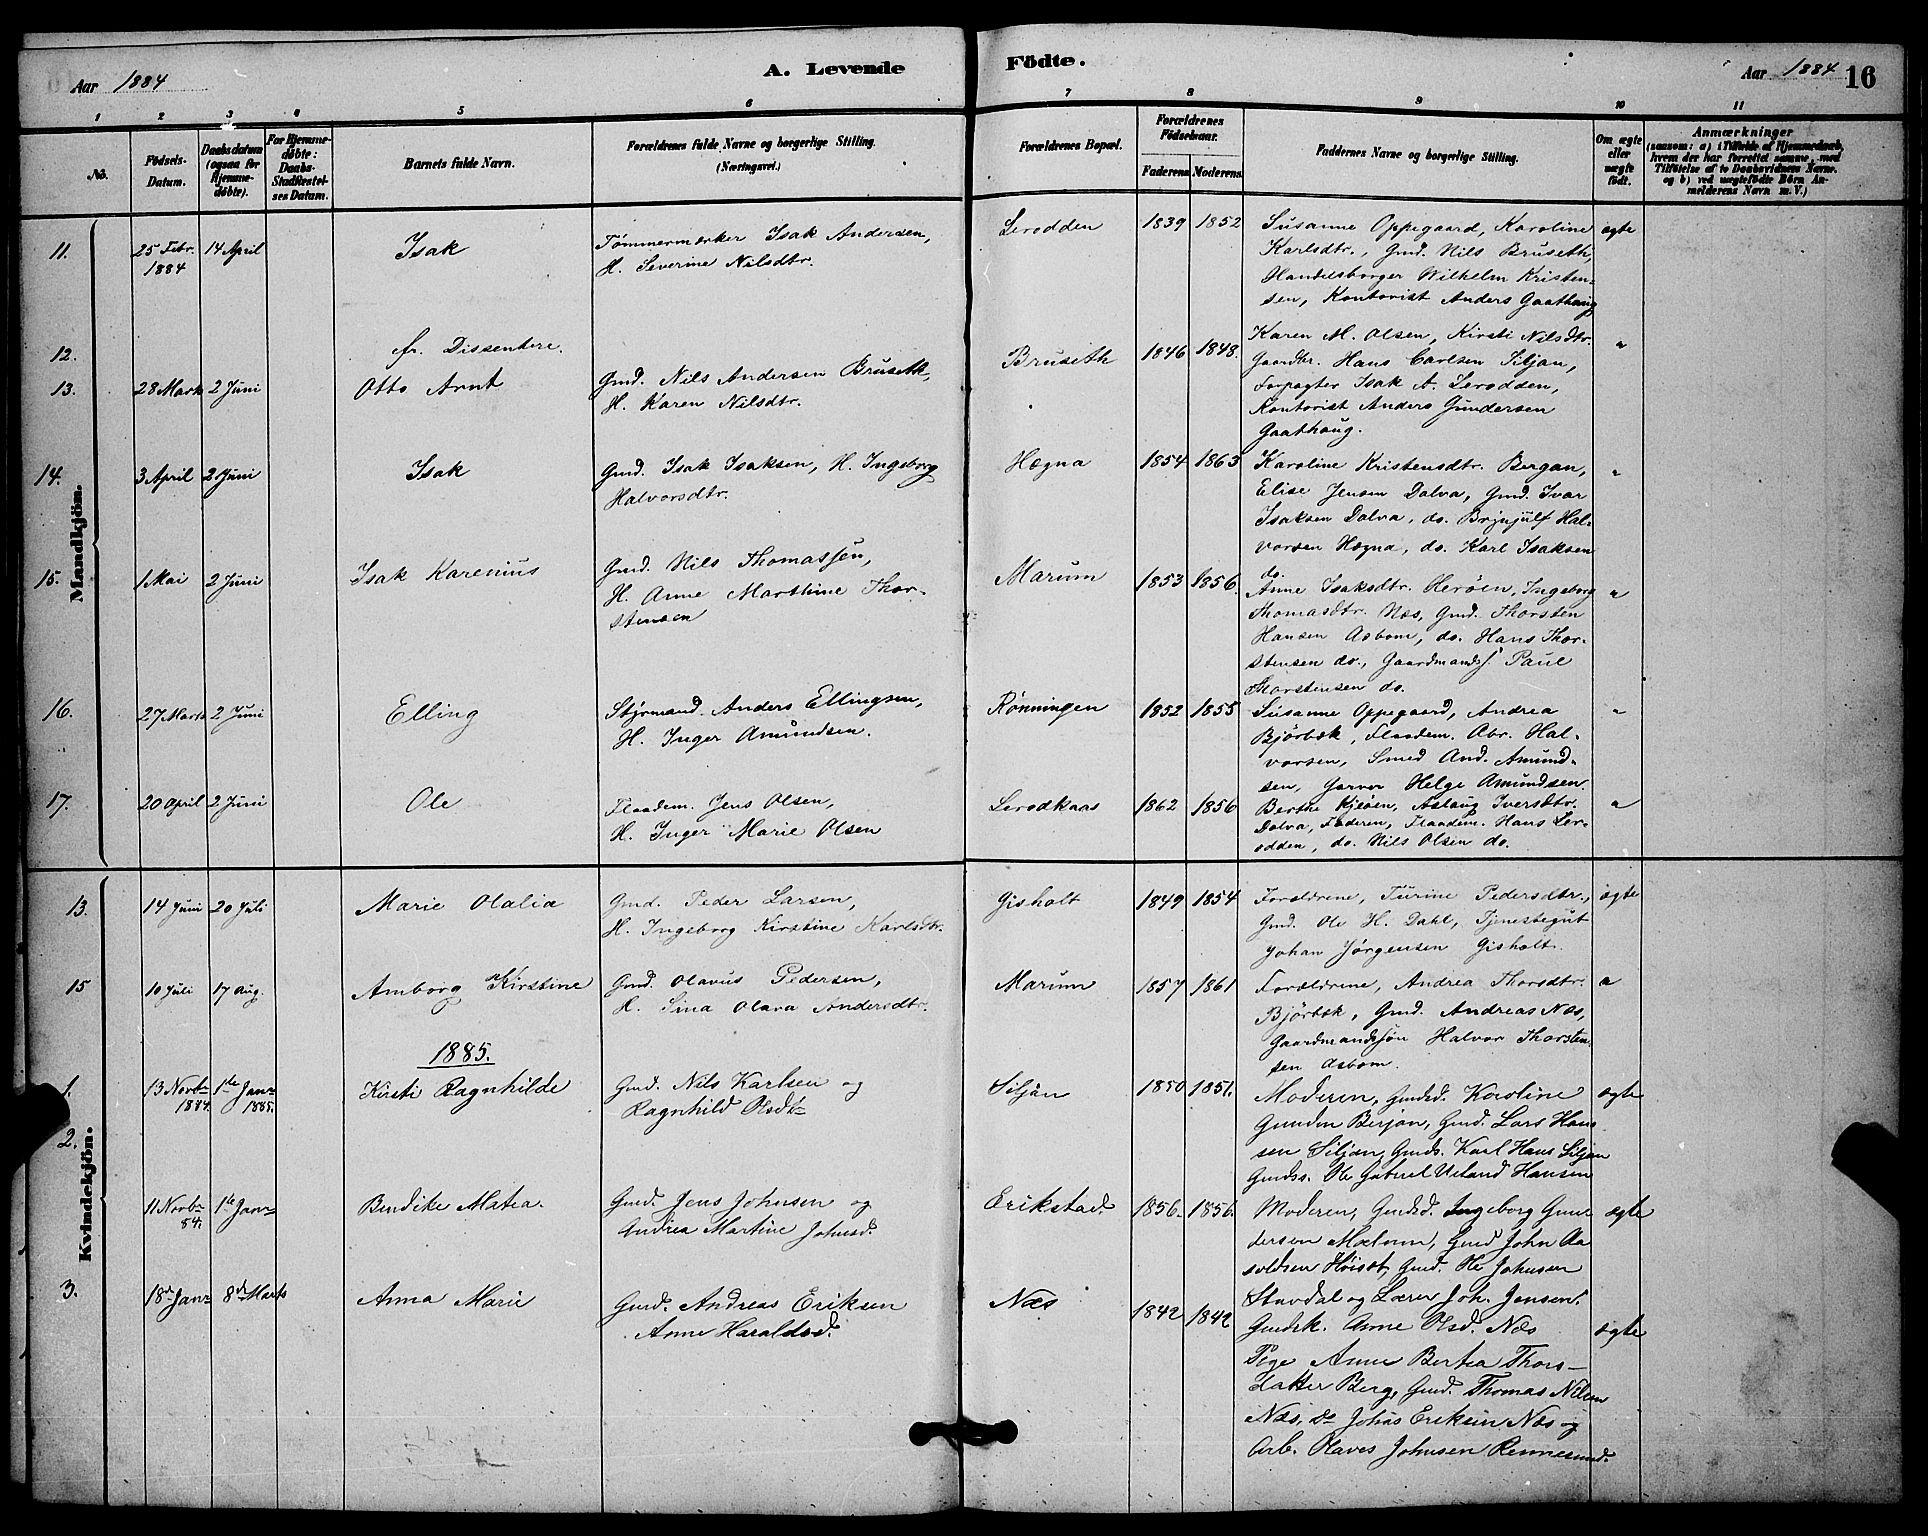 SAKO, Solum kirkebøker, G/Gb/L0003: Klokkerbok nr. II 3, 1880-1898, s. 16